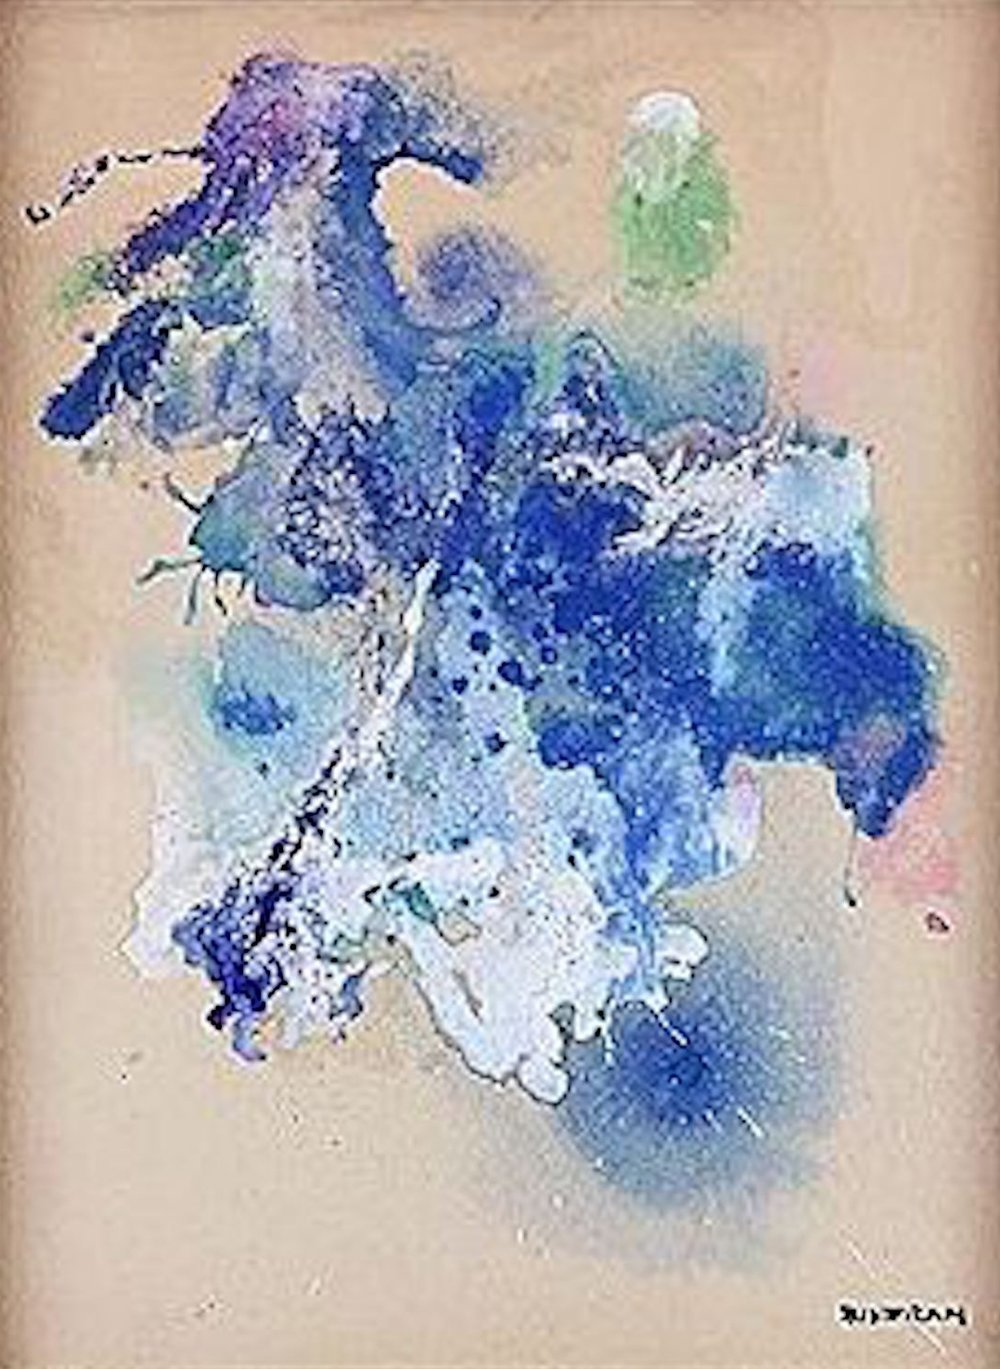 Untitled, 11.5 x 8, oil on board